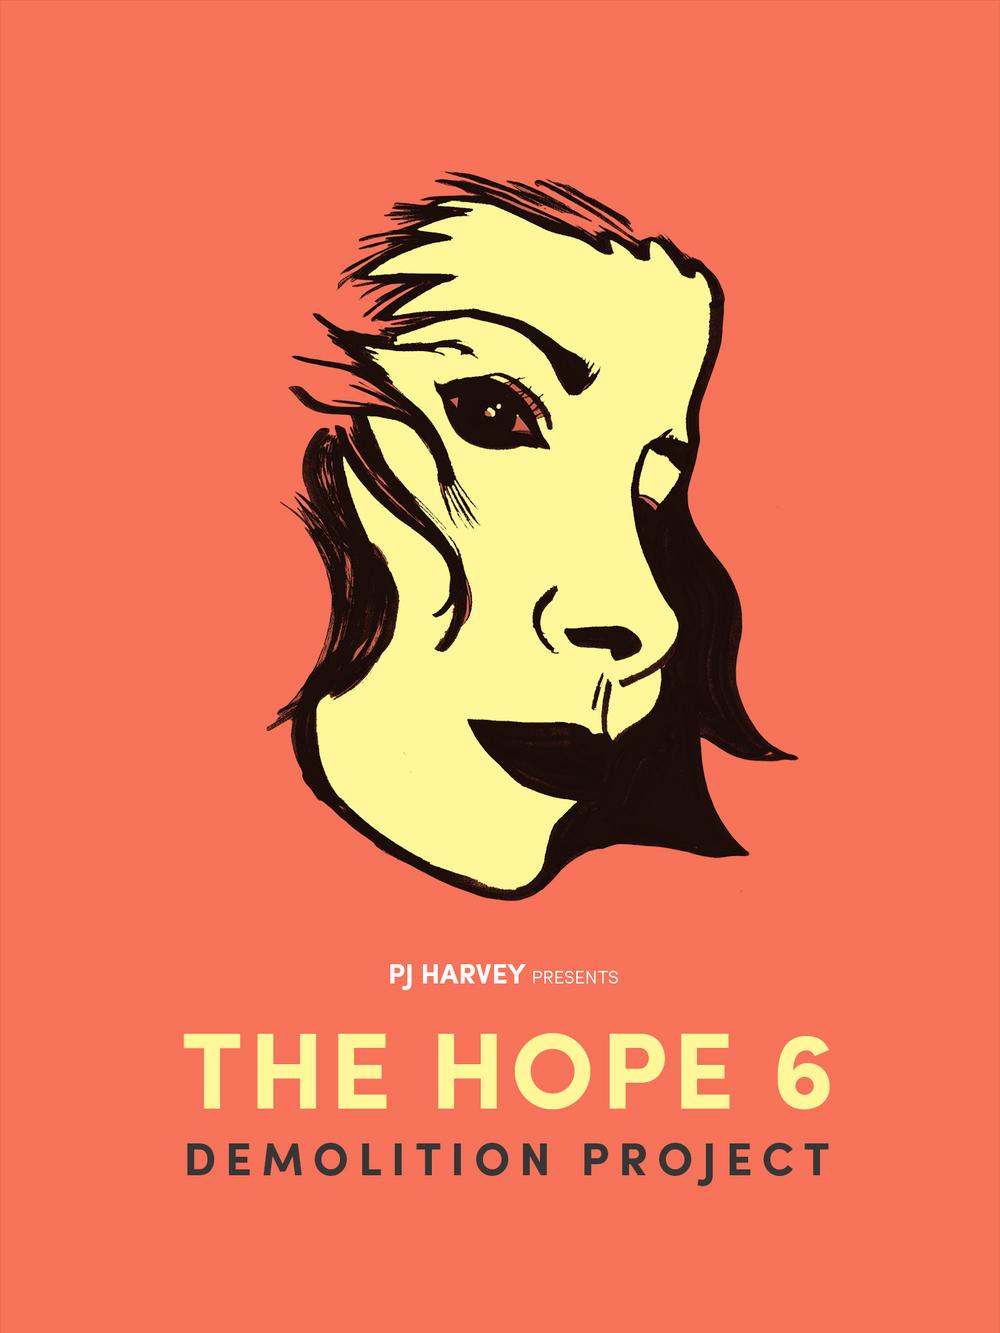 PJ Harvey's The Hope Six Demolition Project